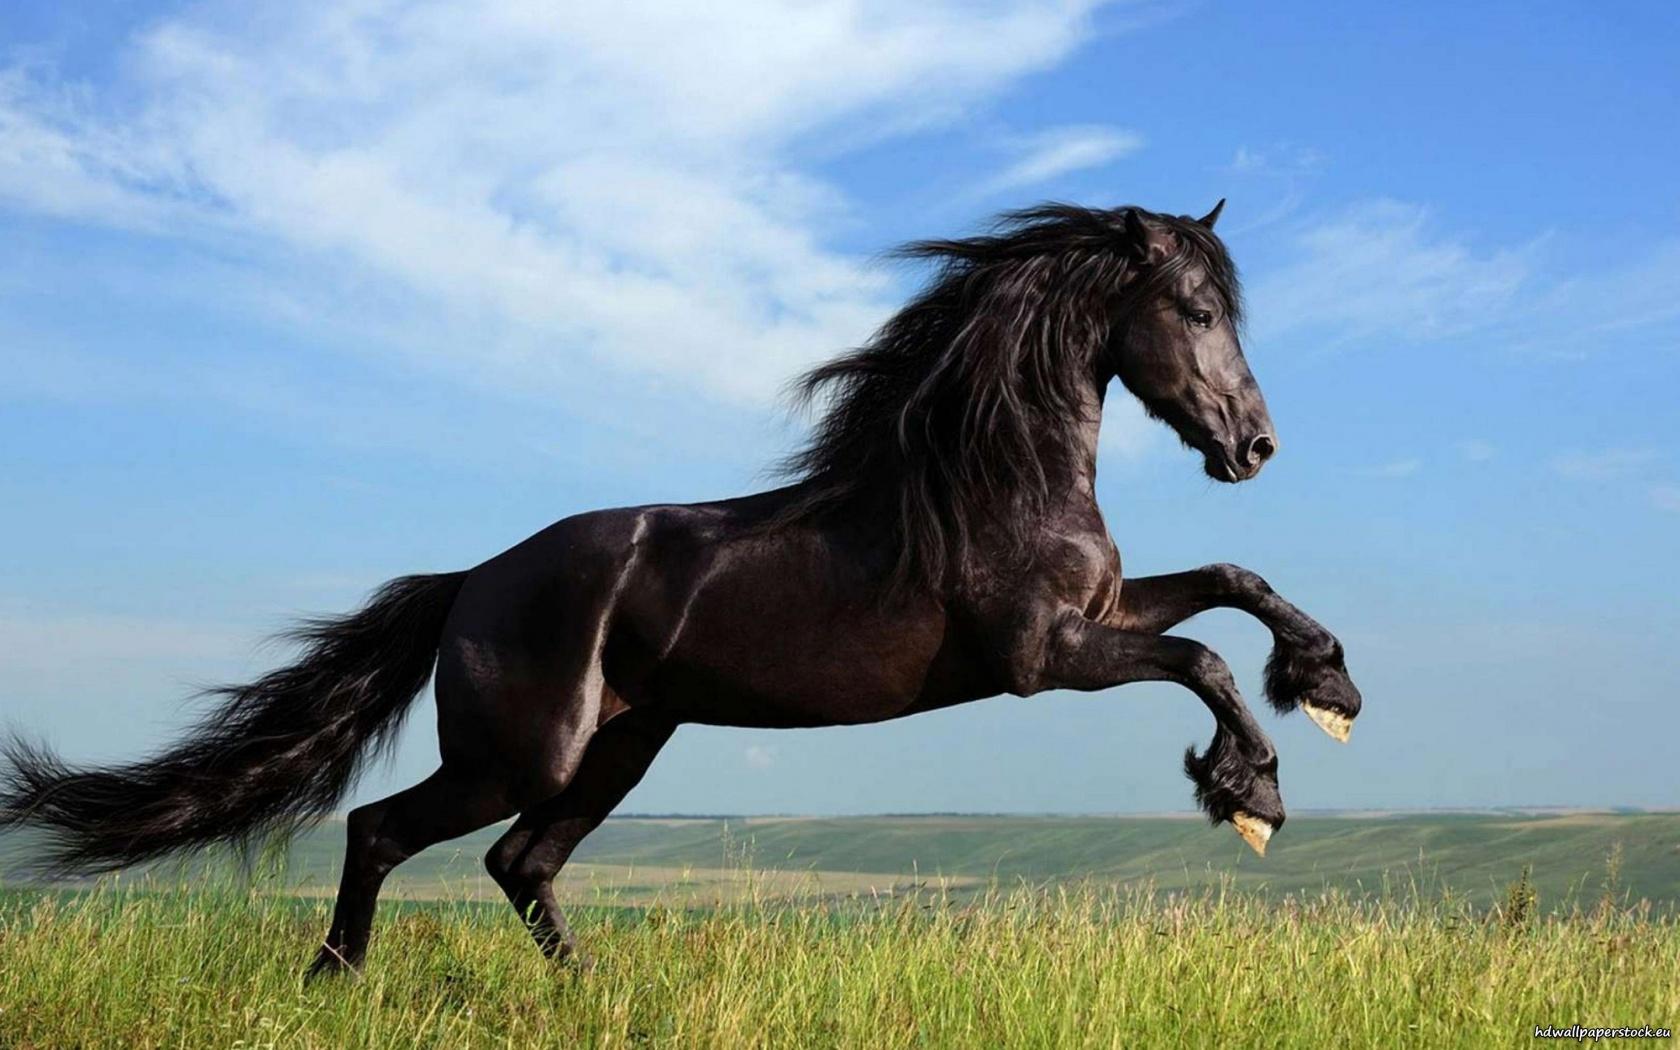 ��� ���� ����� ������ ���� , ���� ���� ���� ���� , ����� ���� ������ 2016 , Photos horses 2015_1412121767_278.